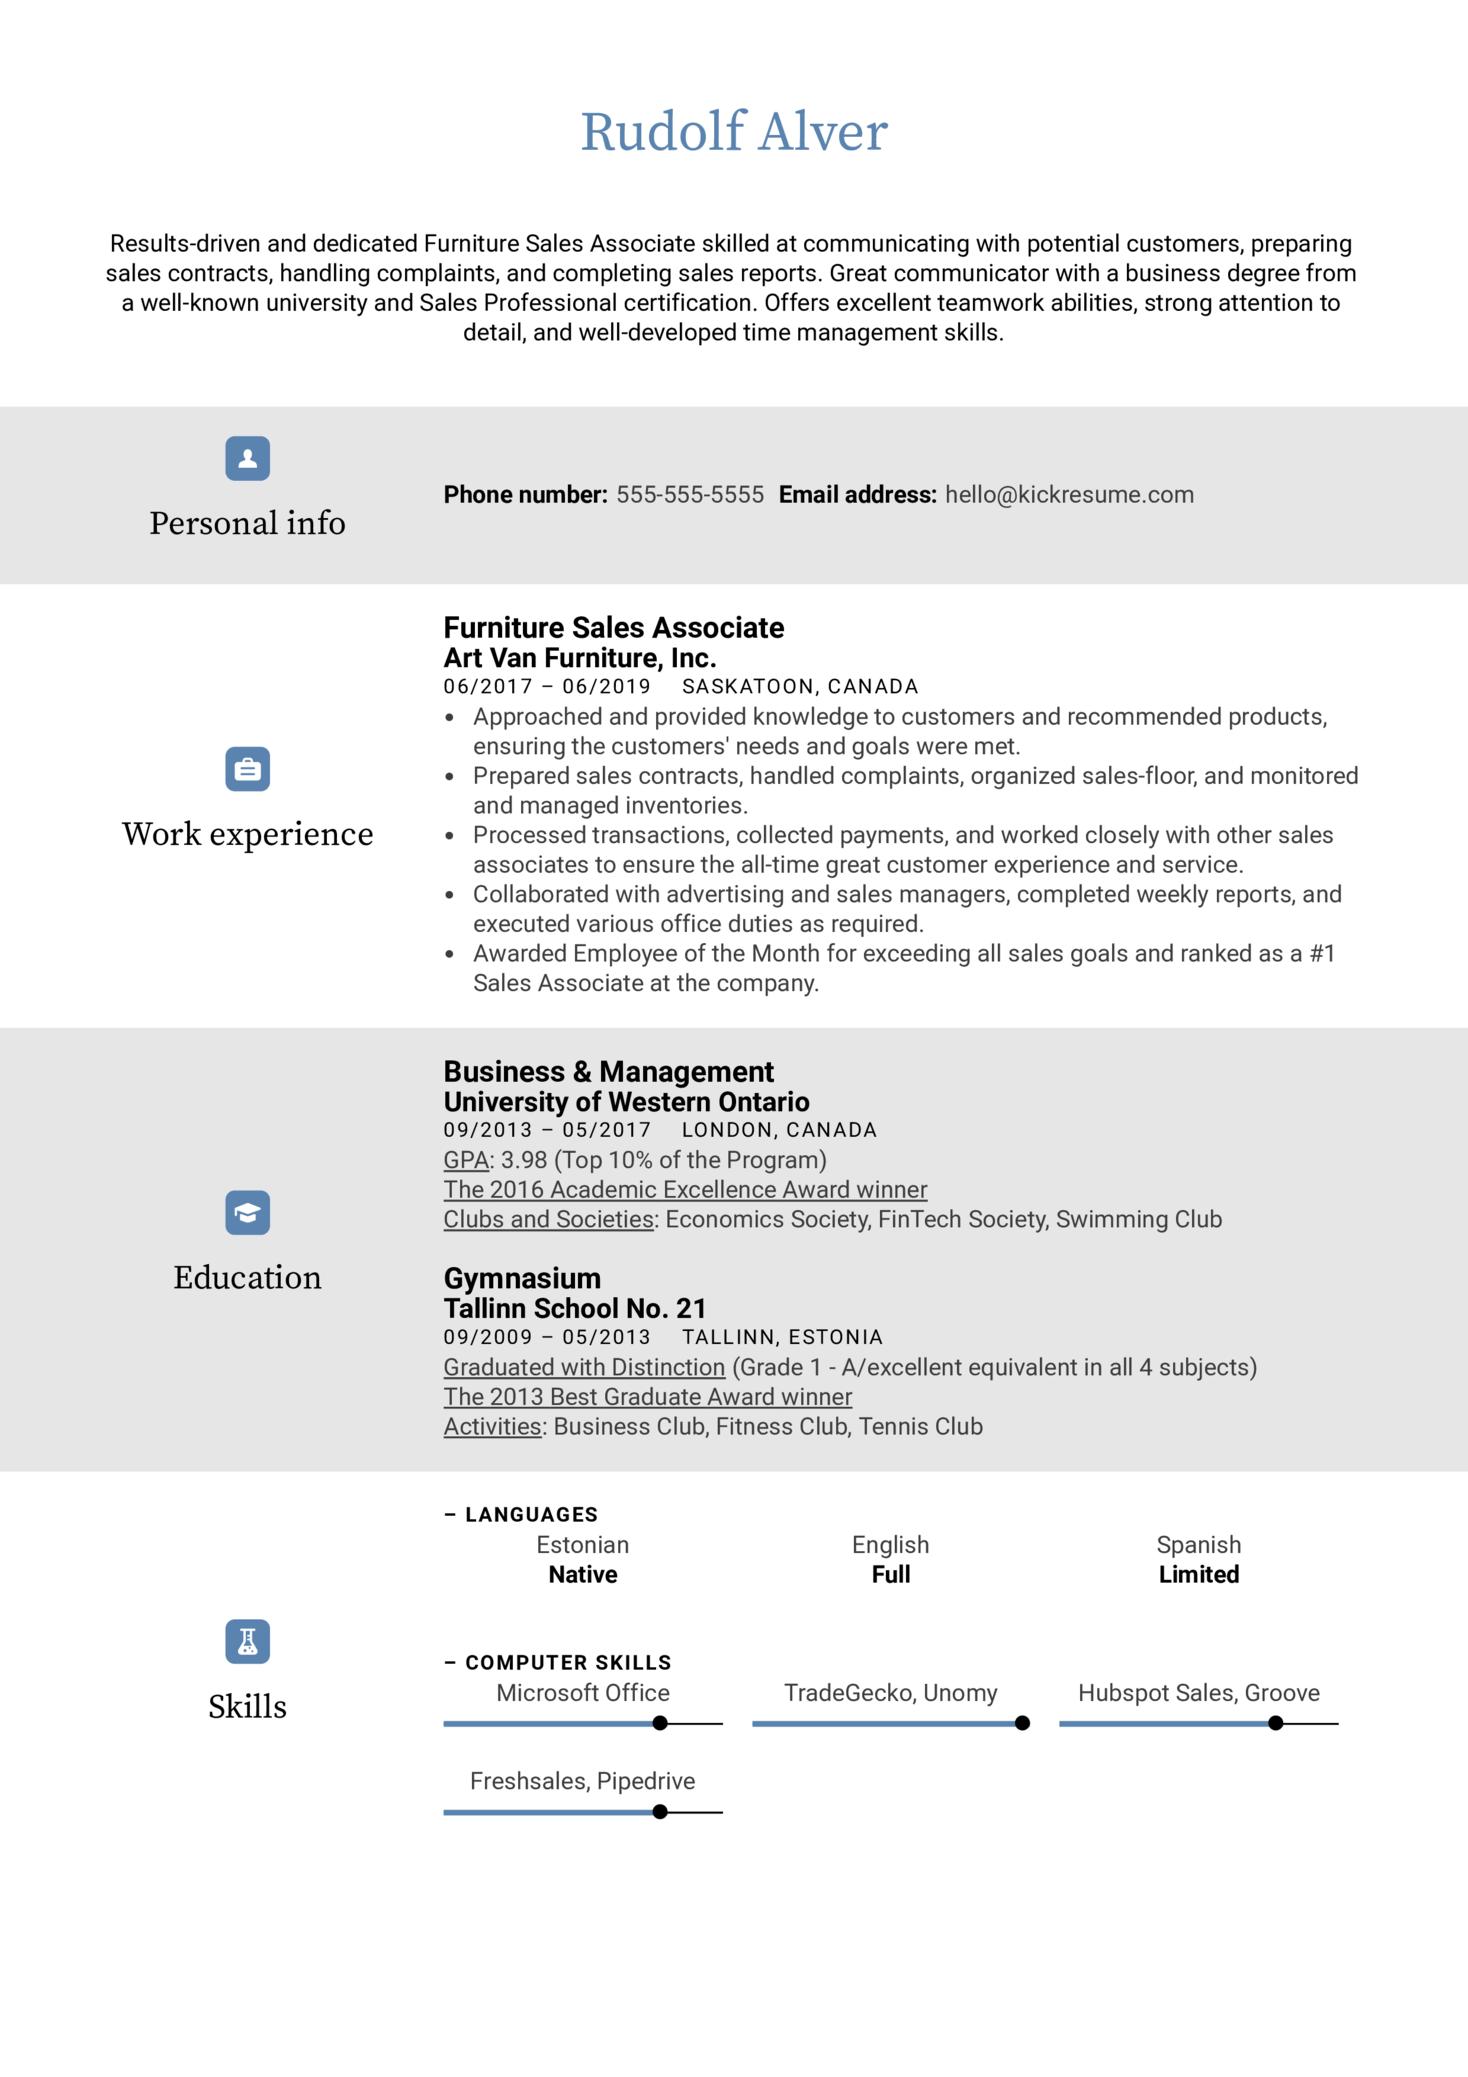 Furniture Sales Associate Resume Sample (Parte 1)